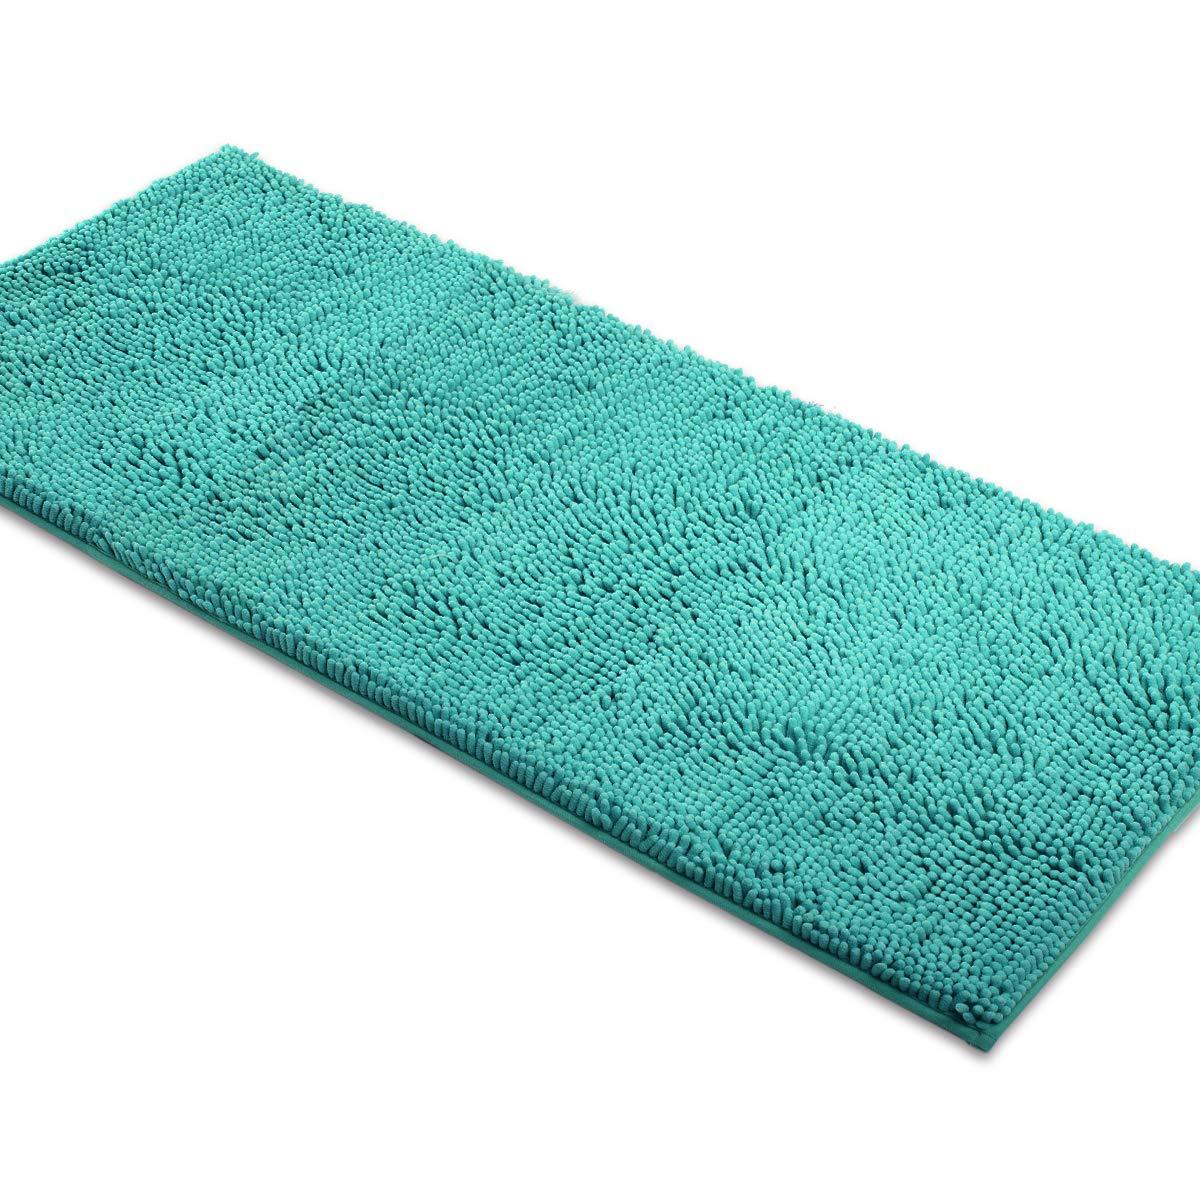 MAYSHINE Non-Slip Bathroom Rugs Shag Shower Mat Machine-Washable Bath mats Runner(47